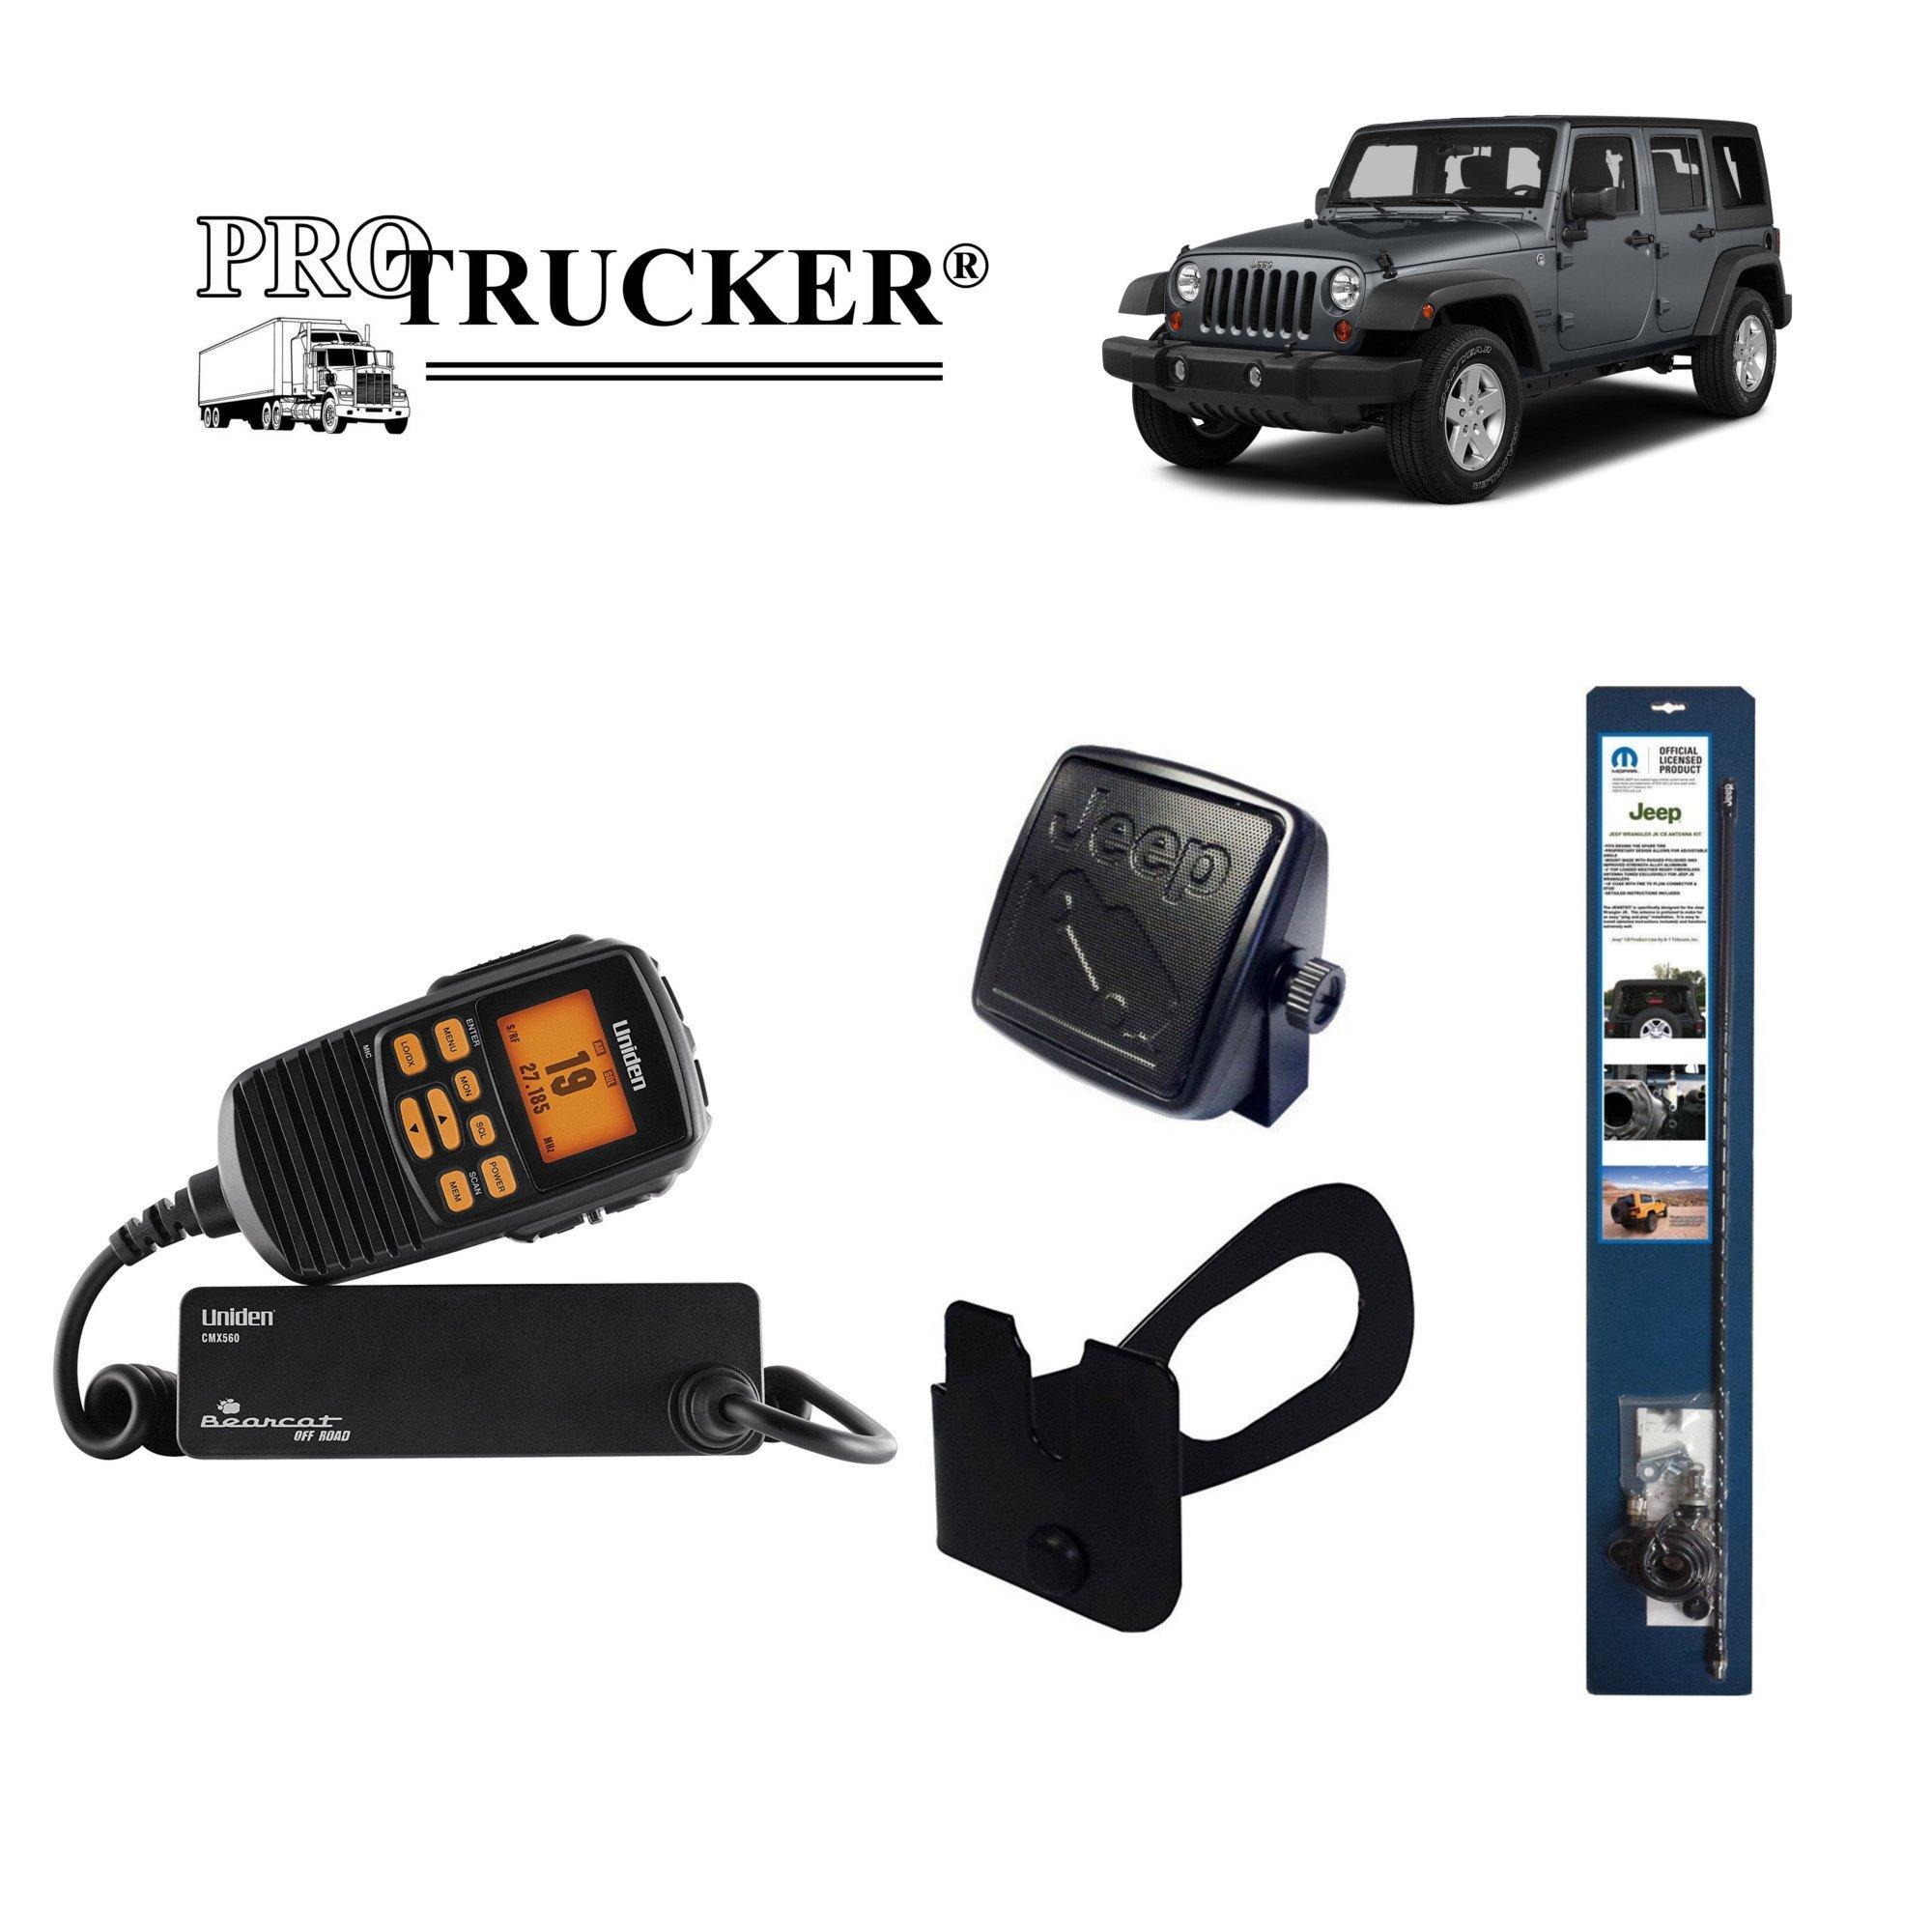 Pro Trucker 2007-Present Jeep JK CB Radio Complete Kit with Uniden Handheld CB Radio, 3' Mopar Antenna, Mount, Coax, Speaker, and Grab Bar Mount by Pro Trucker